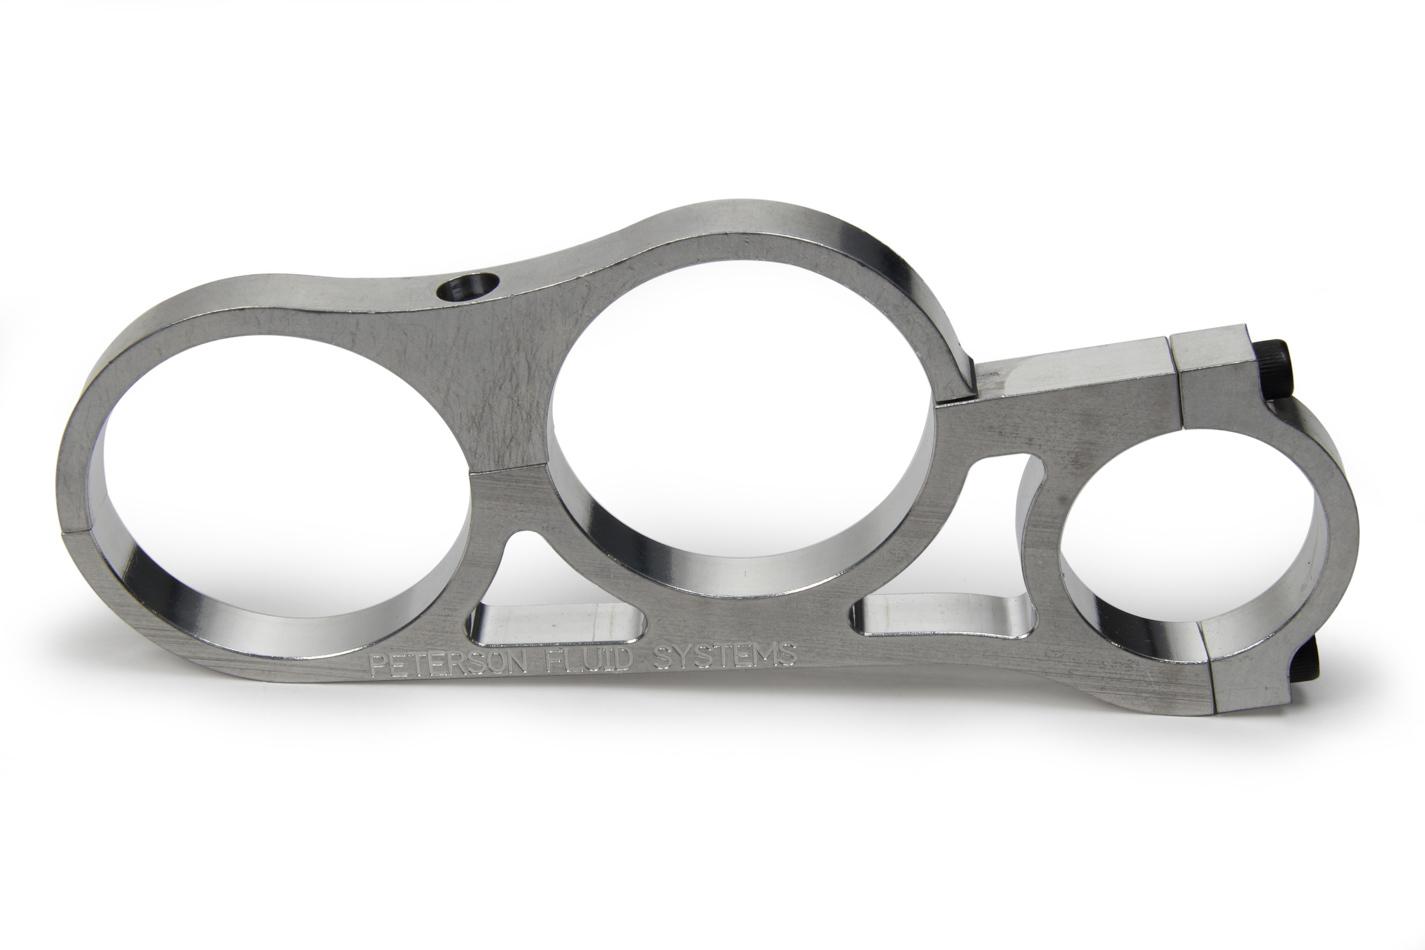 Peterson Fluid Inline Dual Filter Brkt Fits 1.75in Tubing Each